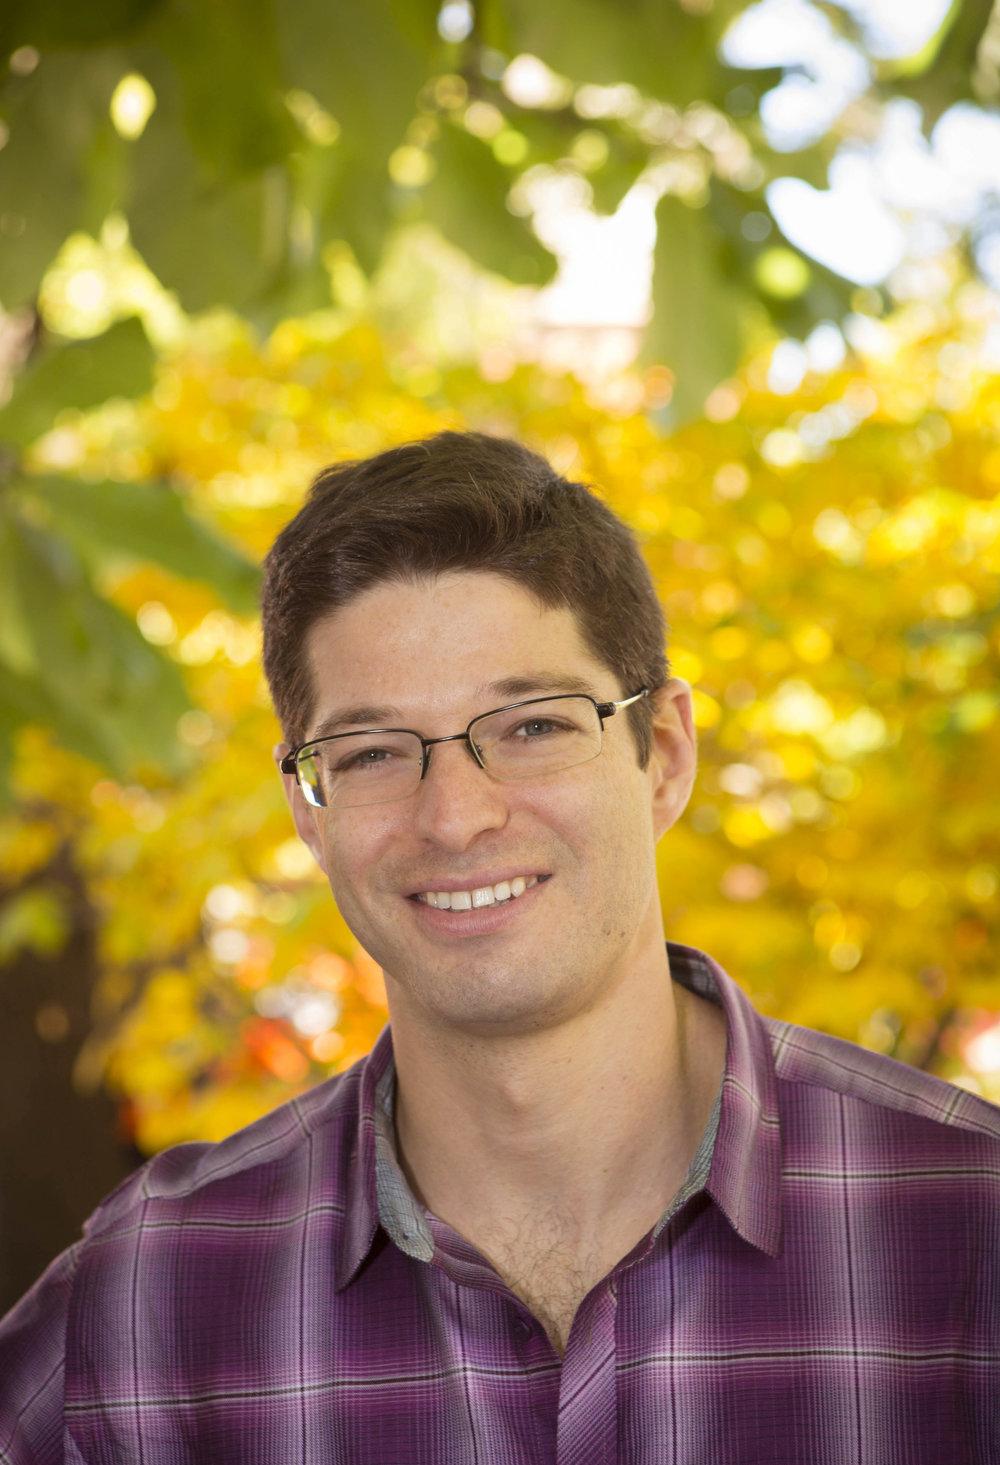 Eric Rutkow